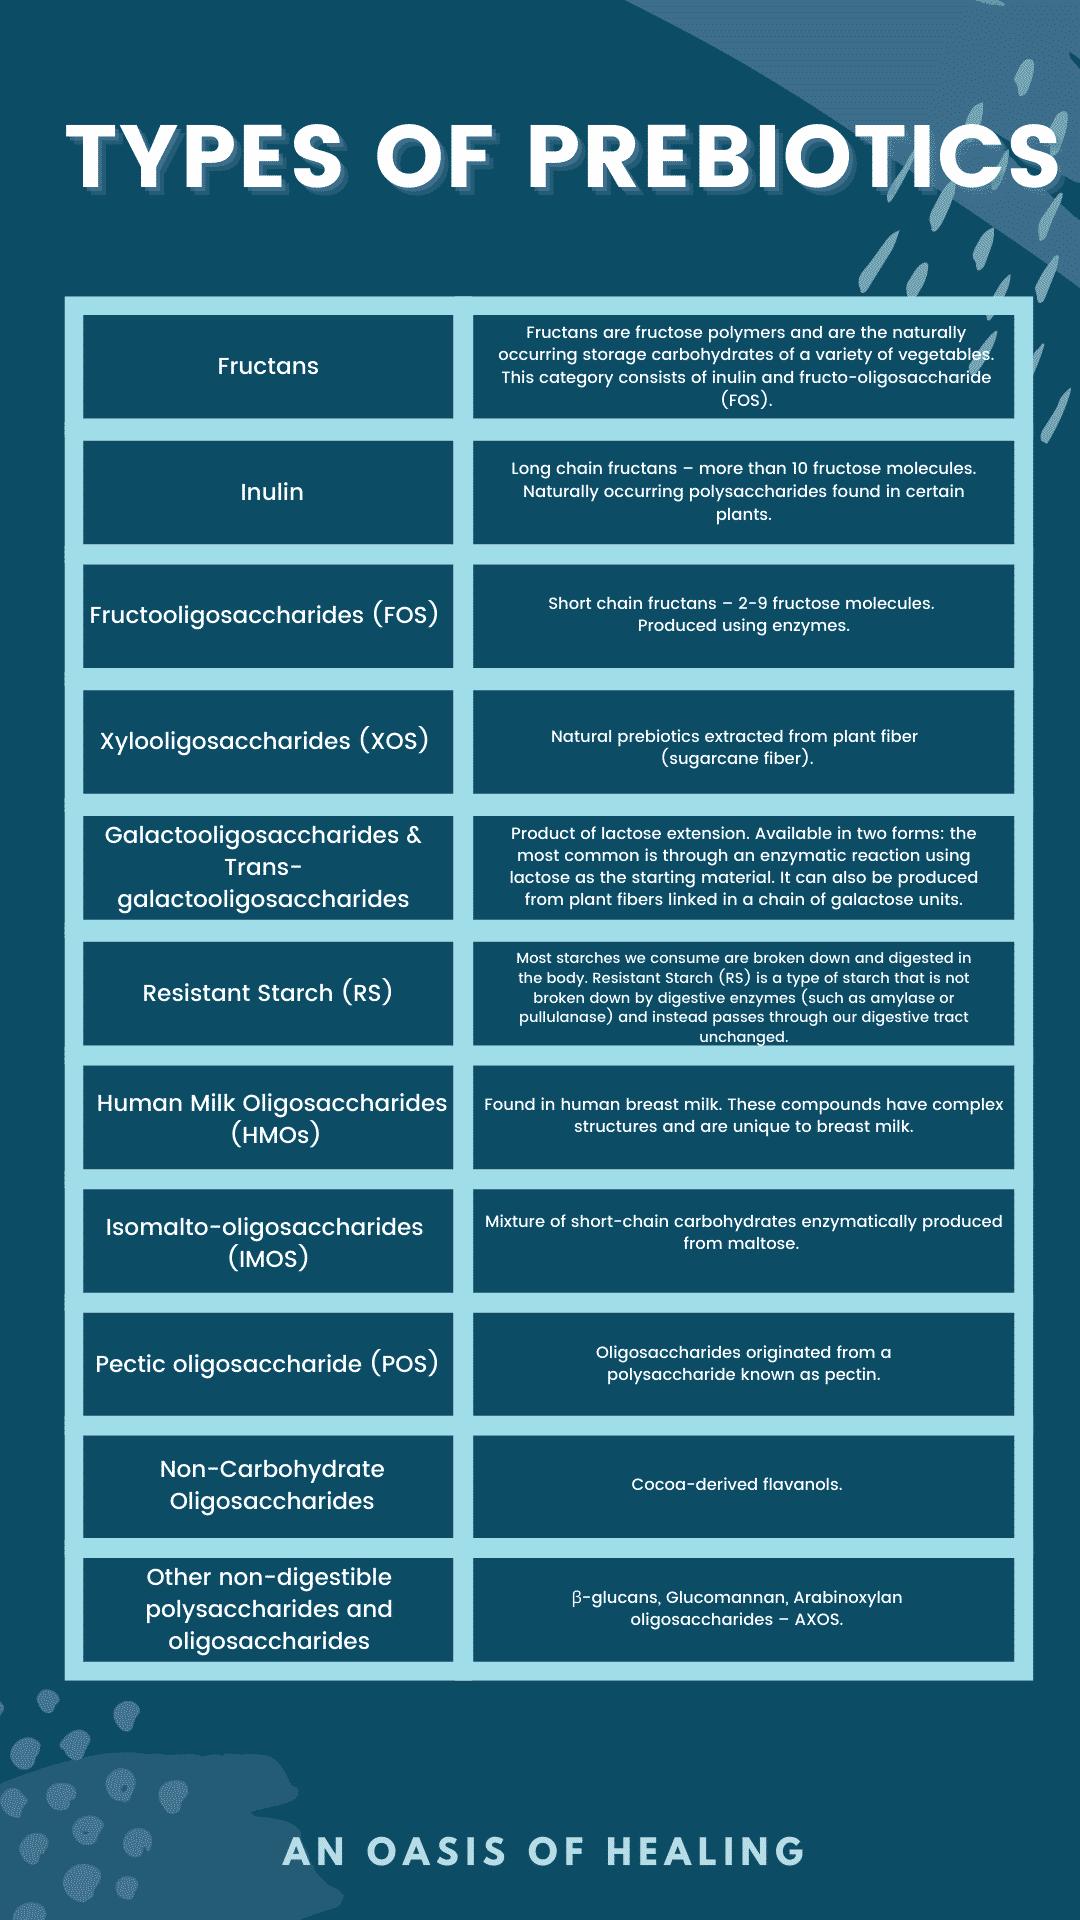 Types of prebiotics